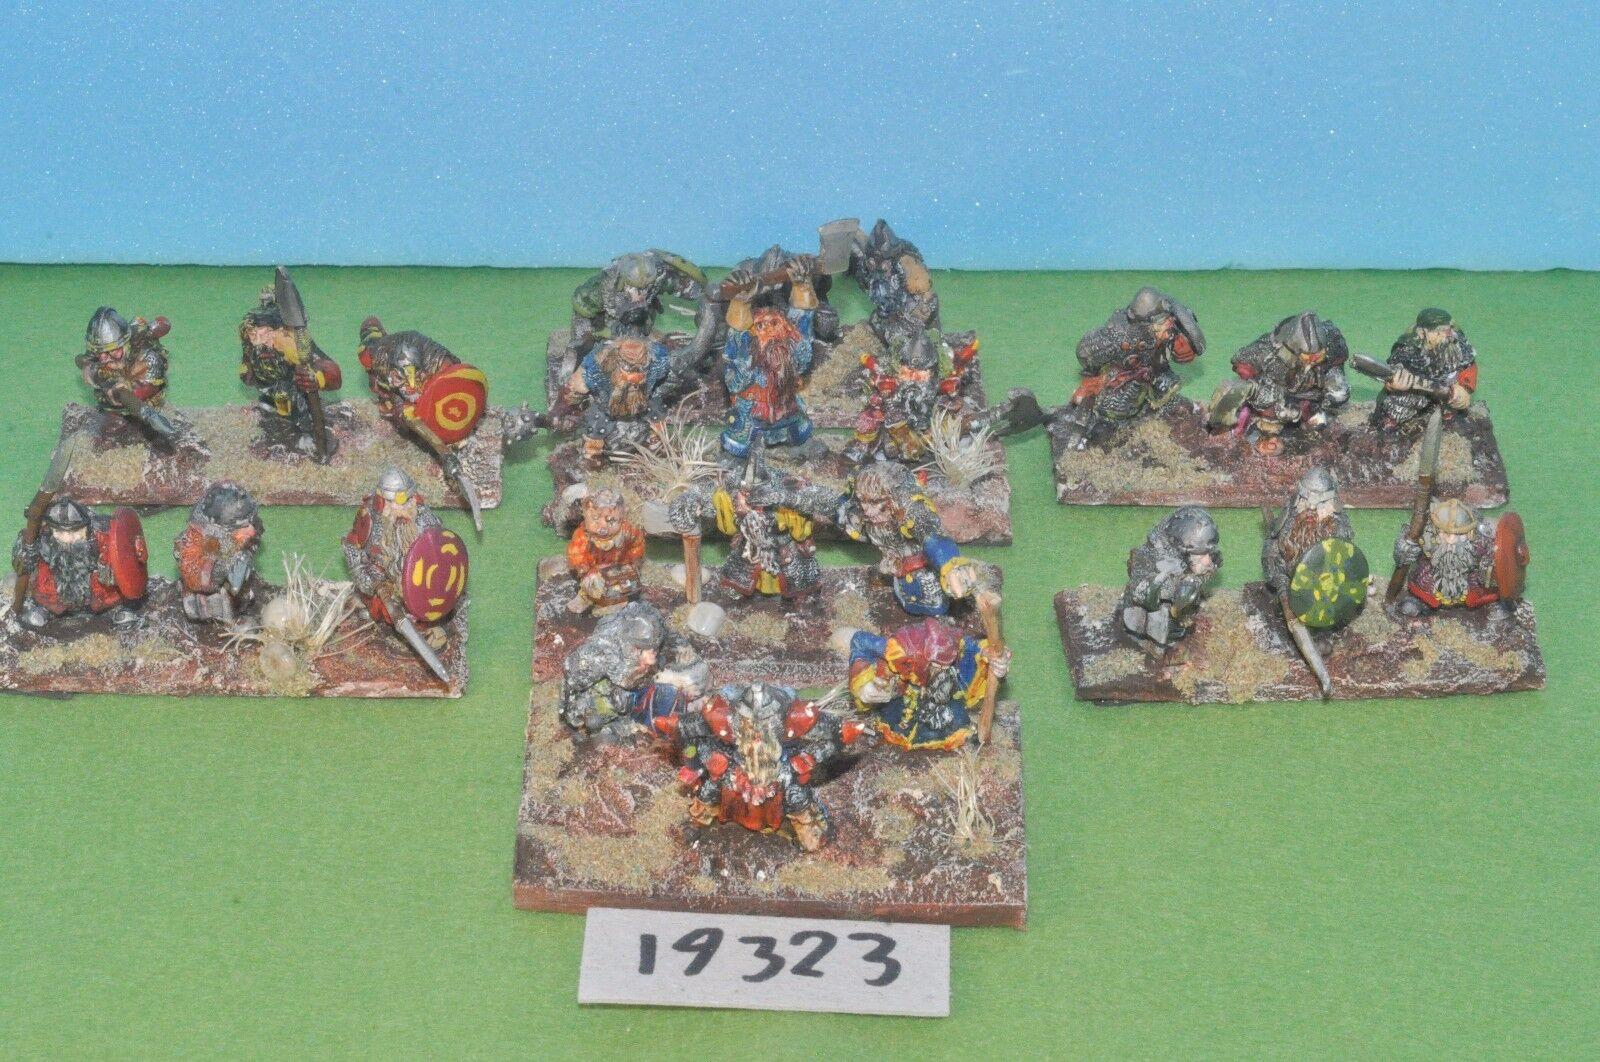 Item fantasy   warhammer - dwarf warriors 24 metal - (19323)